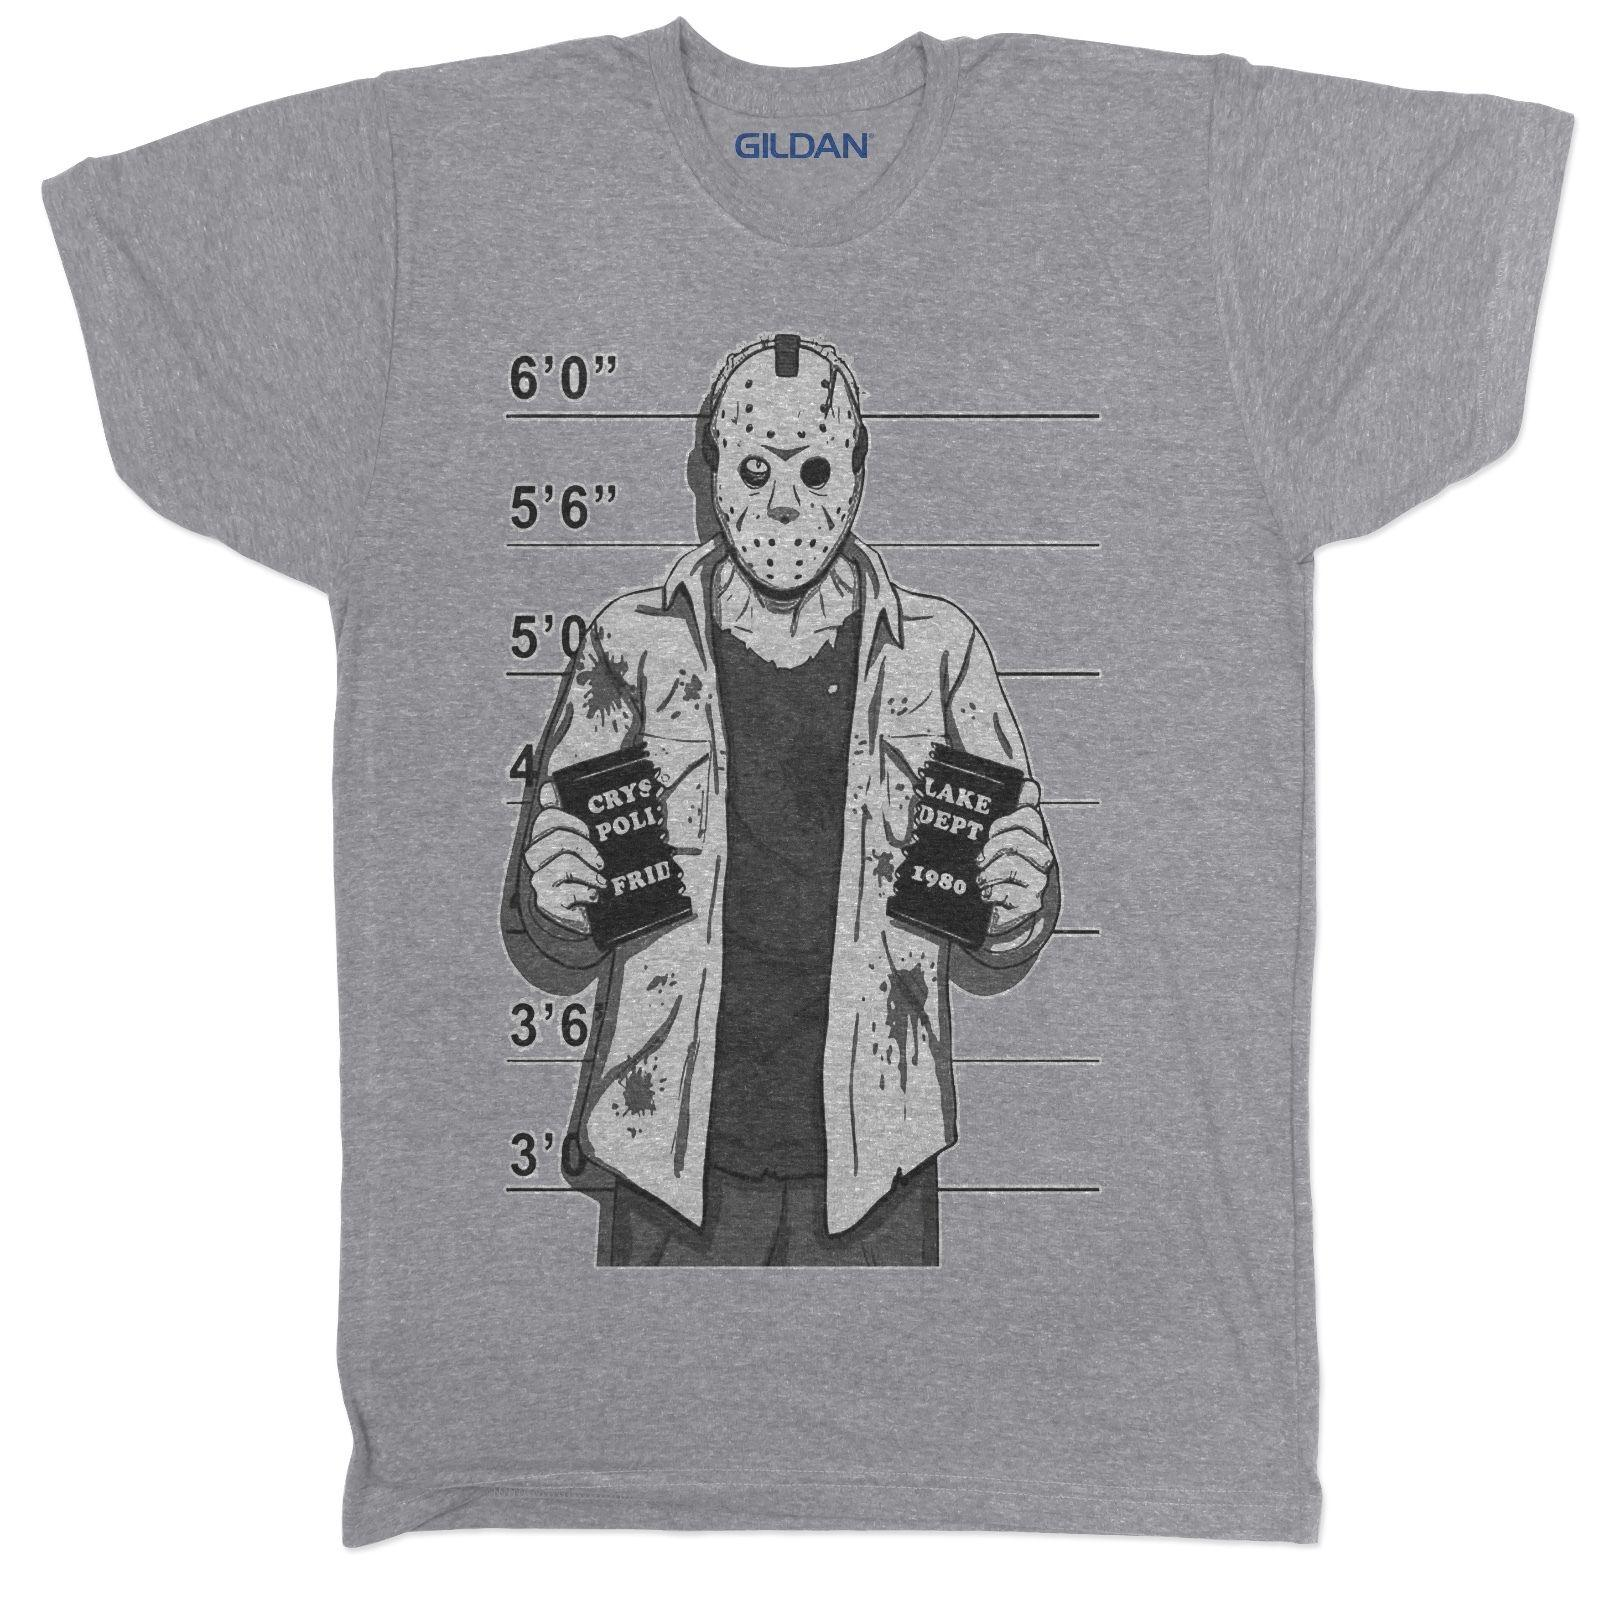 a5759a1e1ef8c4 FRIDAY 13TH JASON HORROR FILM MOVIE FREDDY CHUCKY TUMBLR HALLOWEEN GREY T  SHIRT Classic Quality High Cool Sweatshirts Online Random Funny T Shirts  From ...